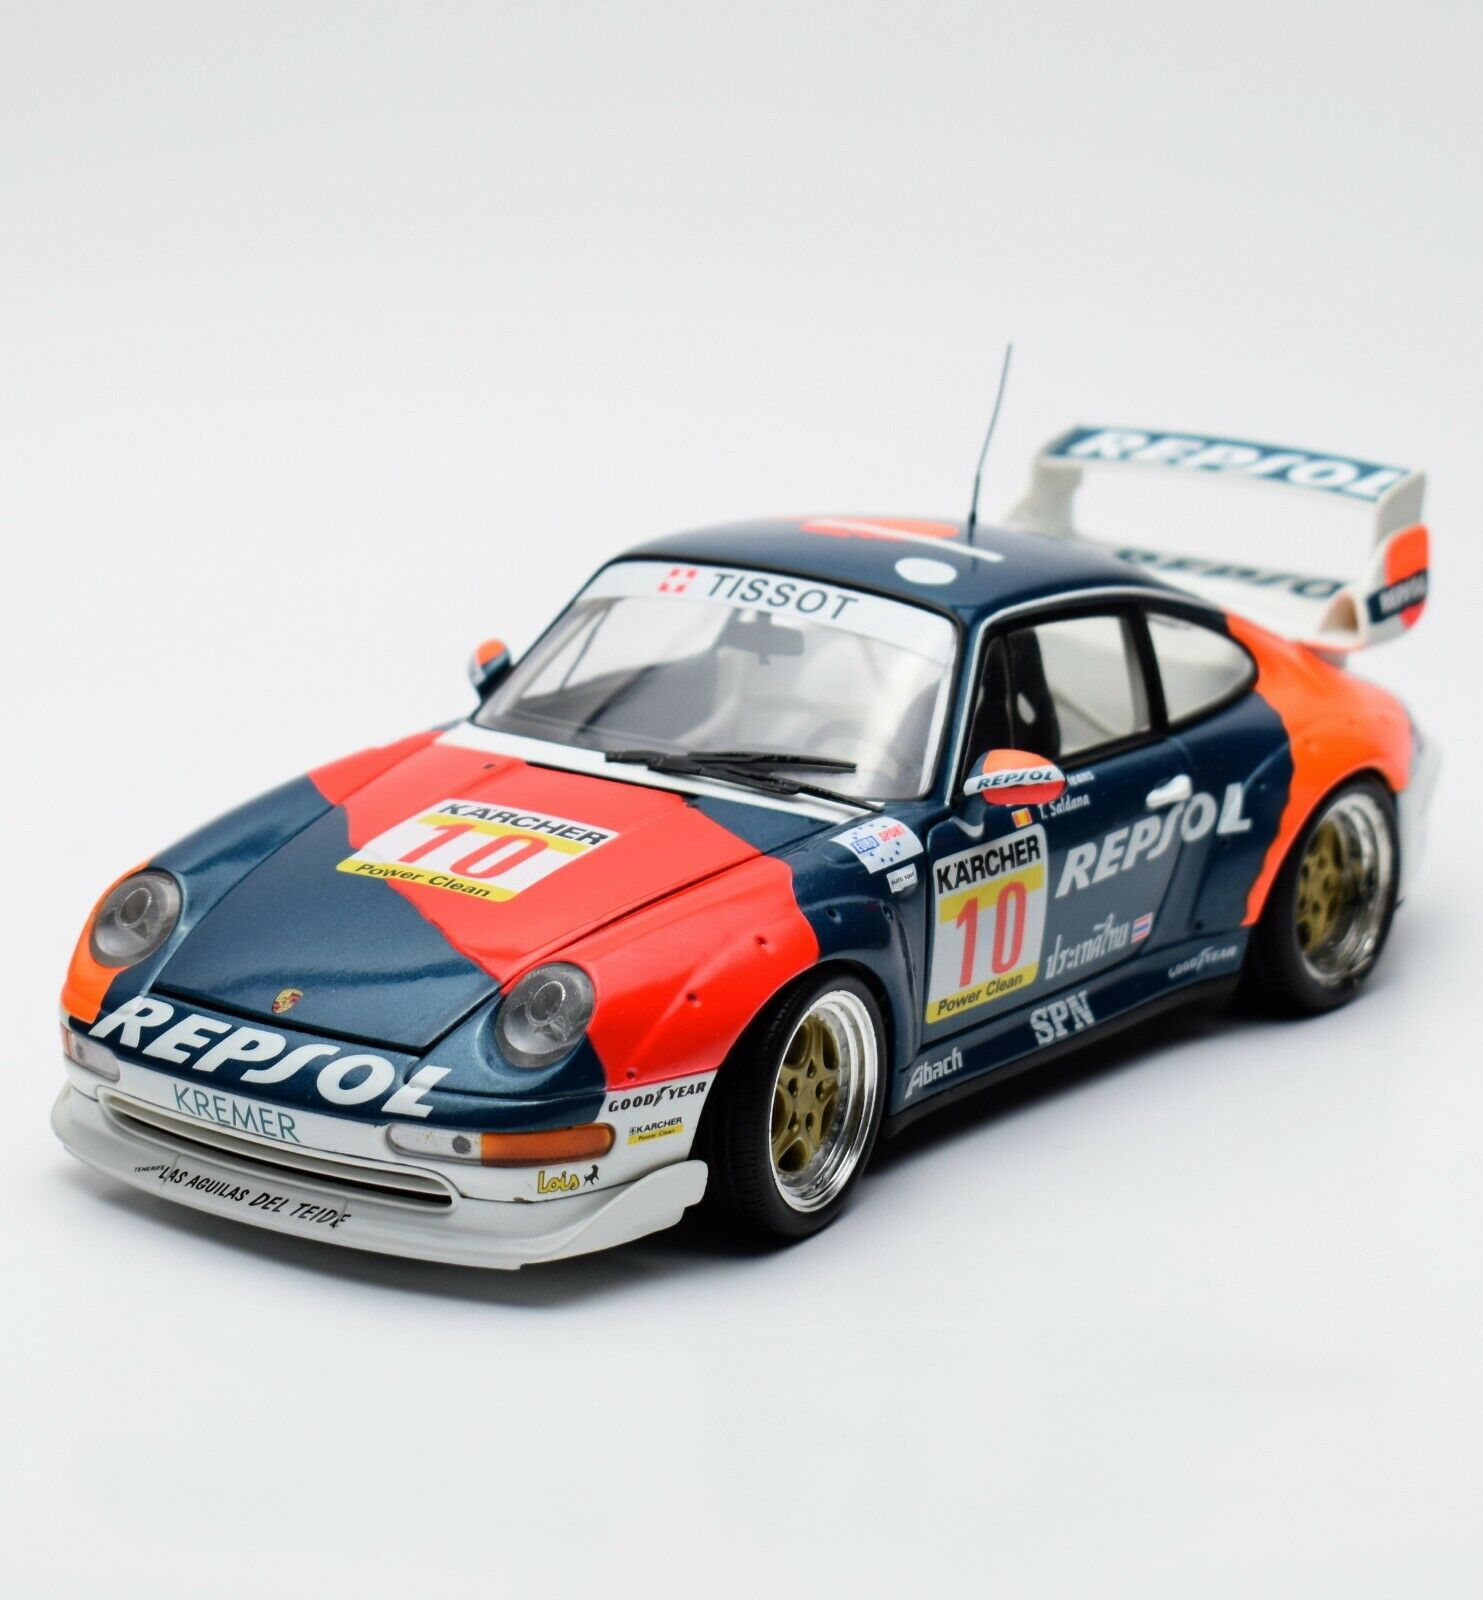 distribución global Ut 39632 Porsche 911 gt2 1996 1996 1996 a de Orleans-t. saldana  10, 1 18, embalaje original, k012  la mejor oferta de tienda online